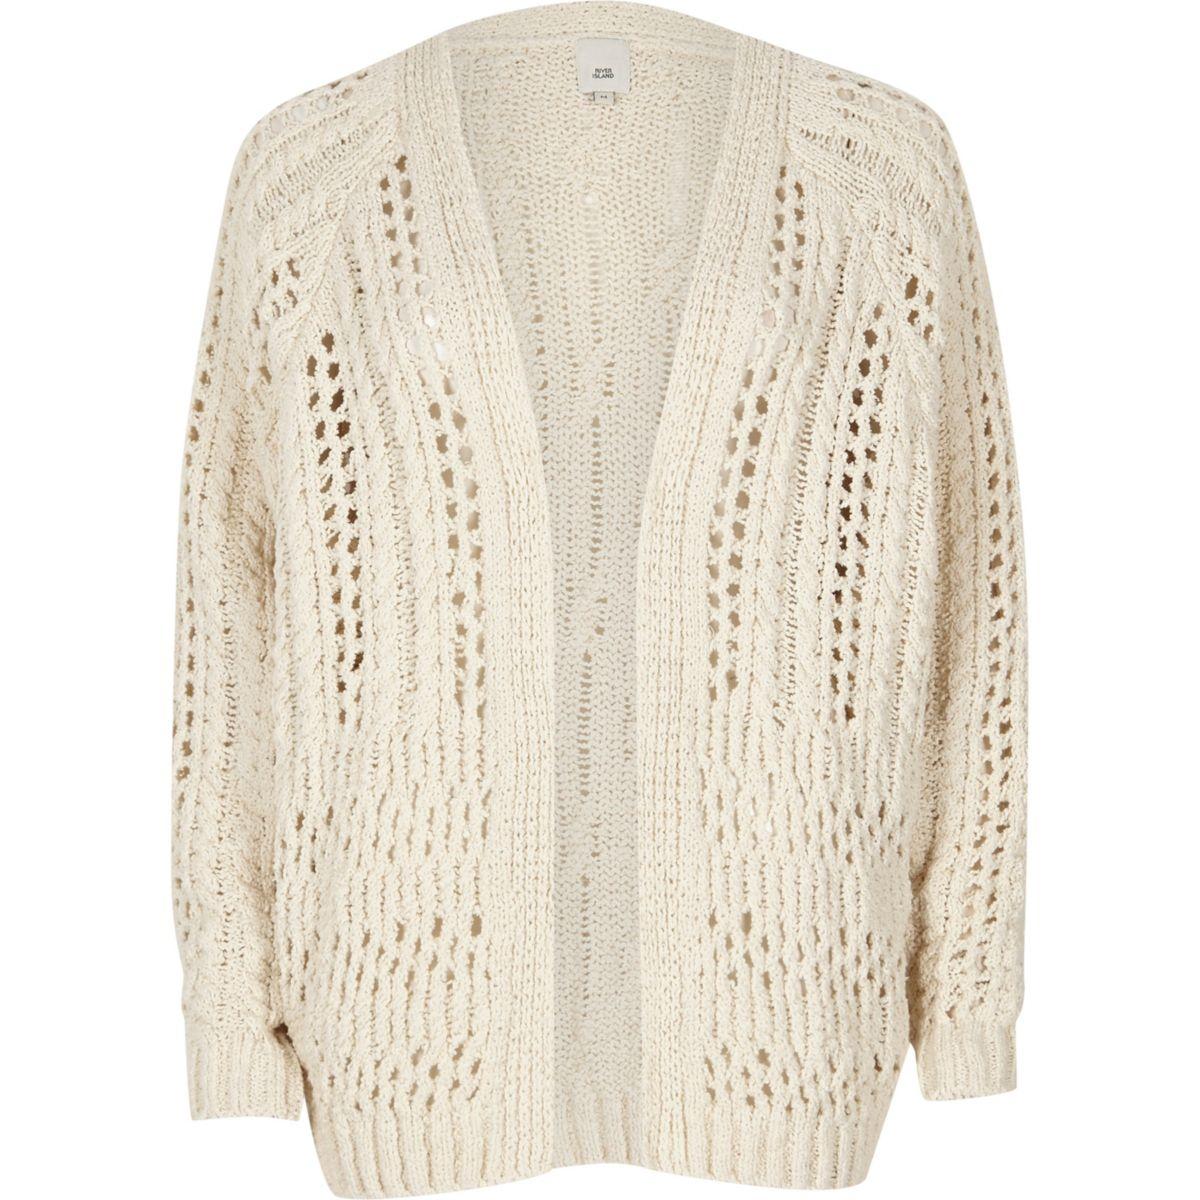 Light cream open knit cardigan